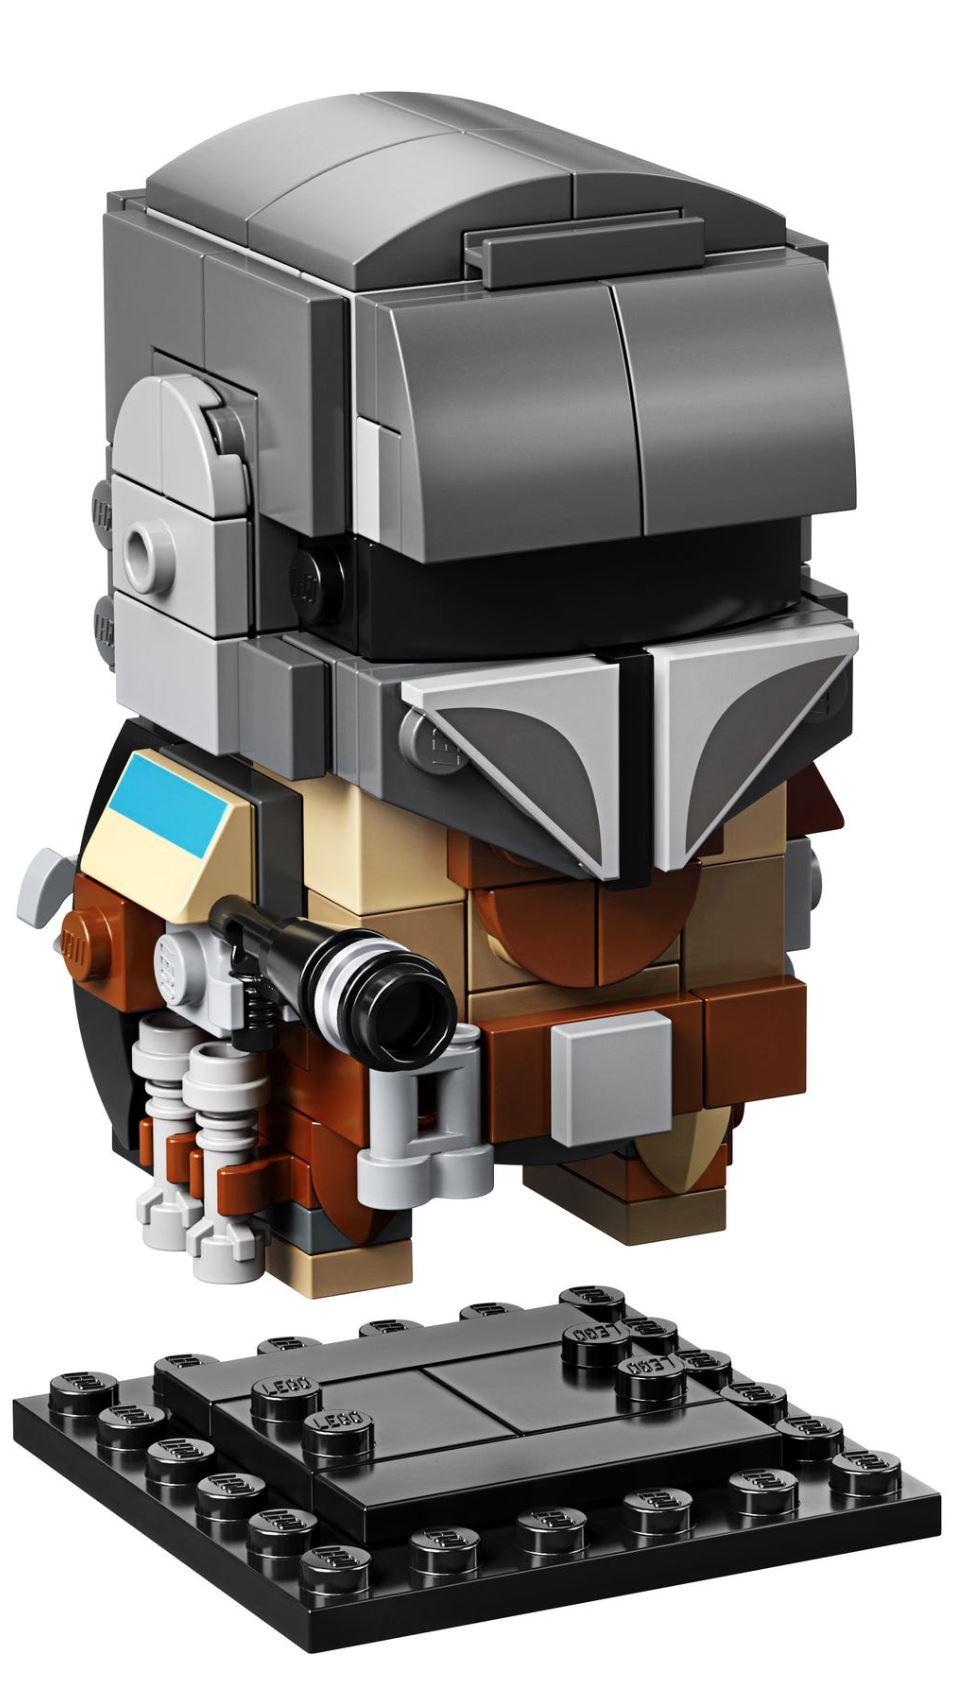 LEGO StarWars 75317 BrickHeadz The Mandalorian & The Child 75317_19